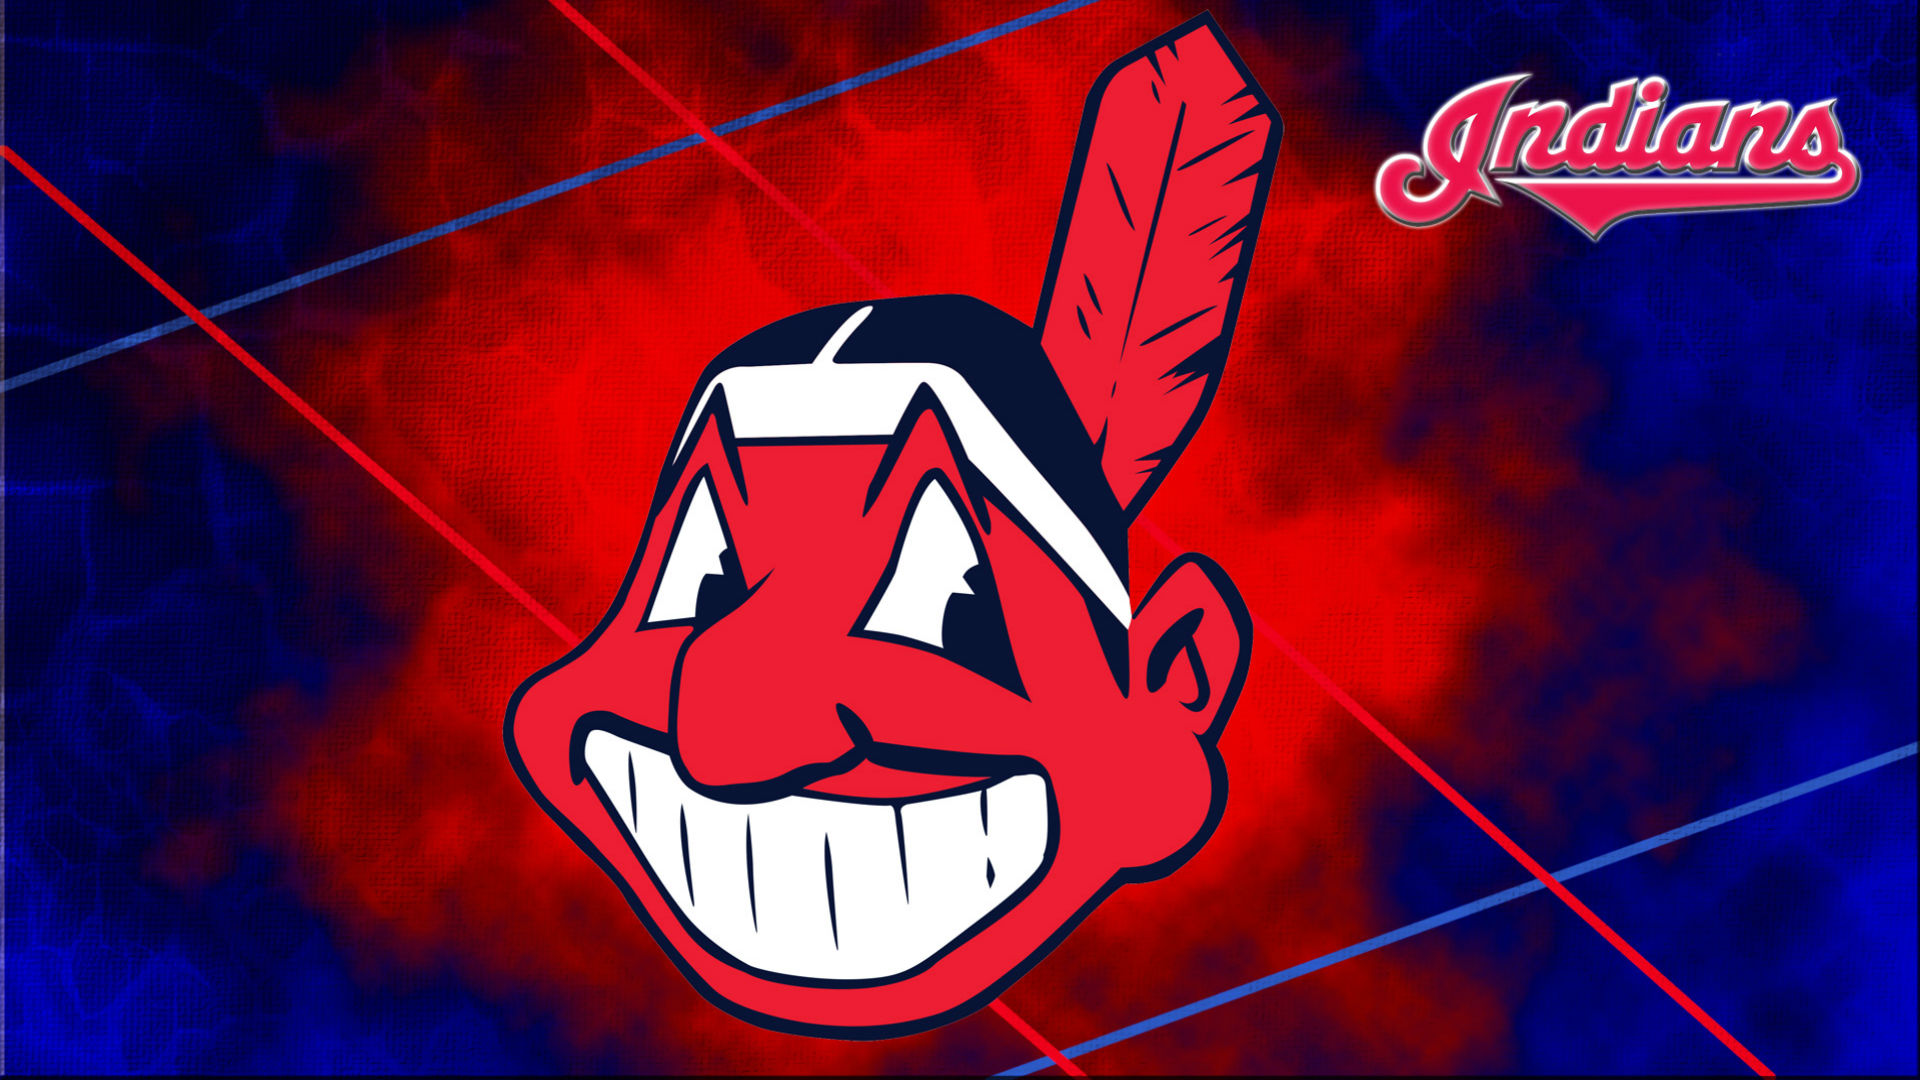 Cleveland Indians: Cleveland Indians Wallpaper